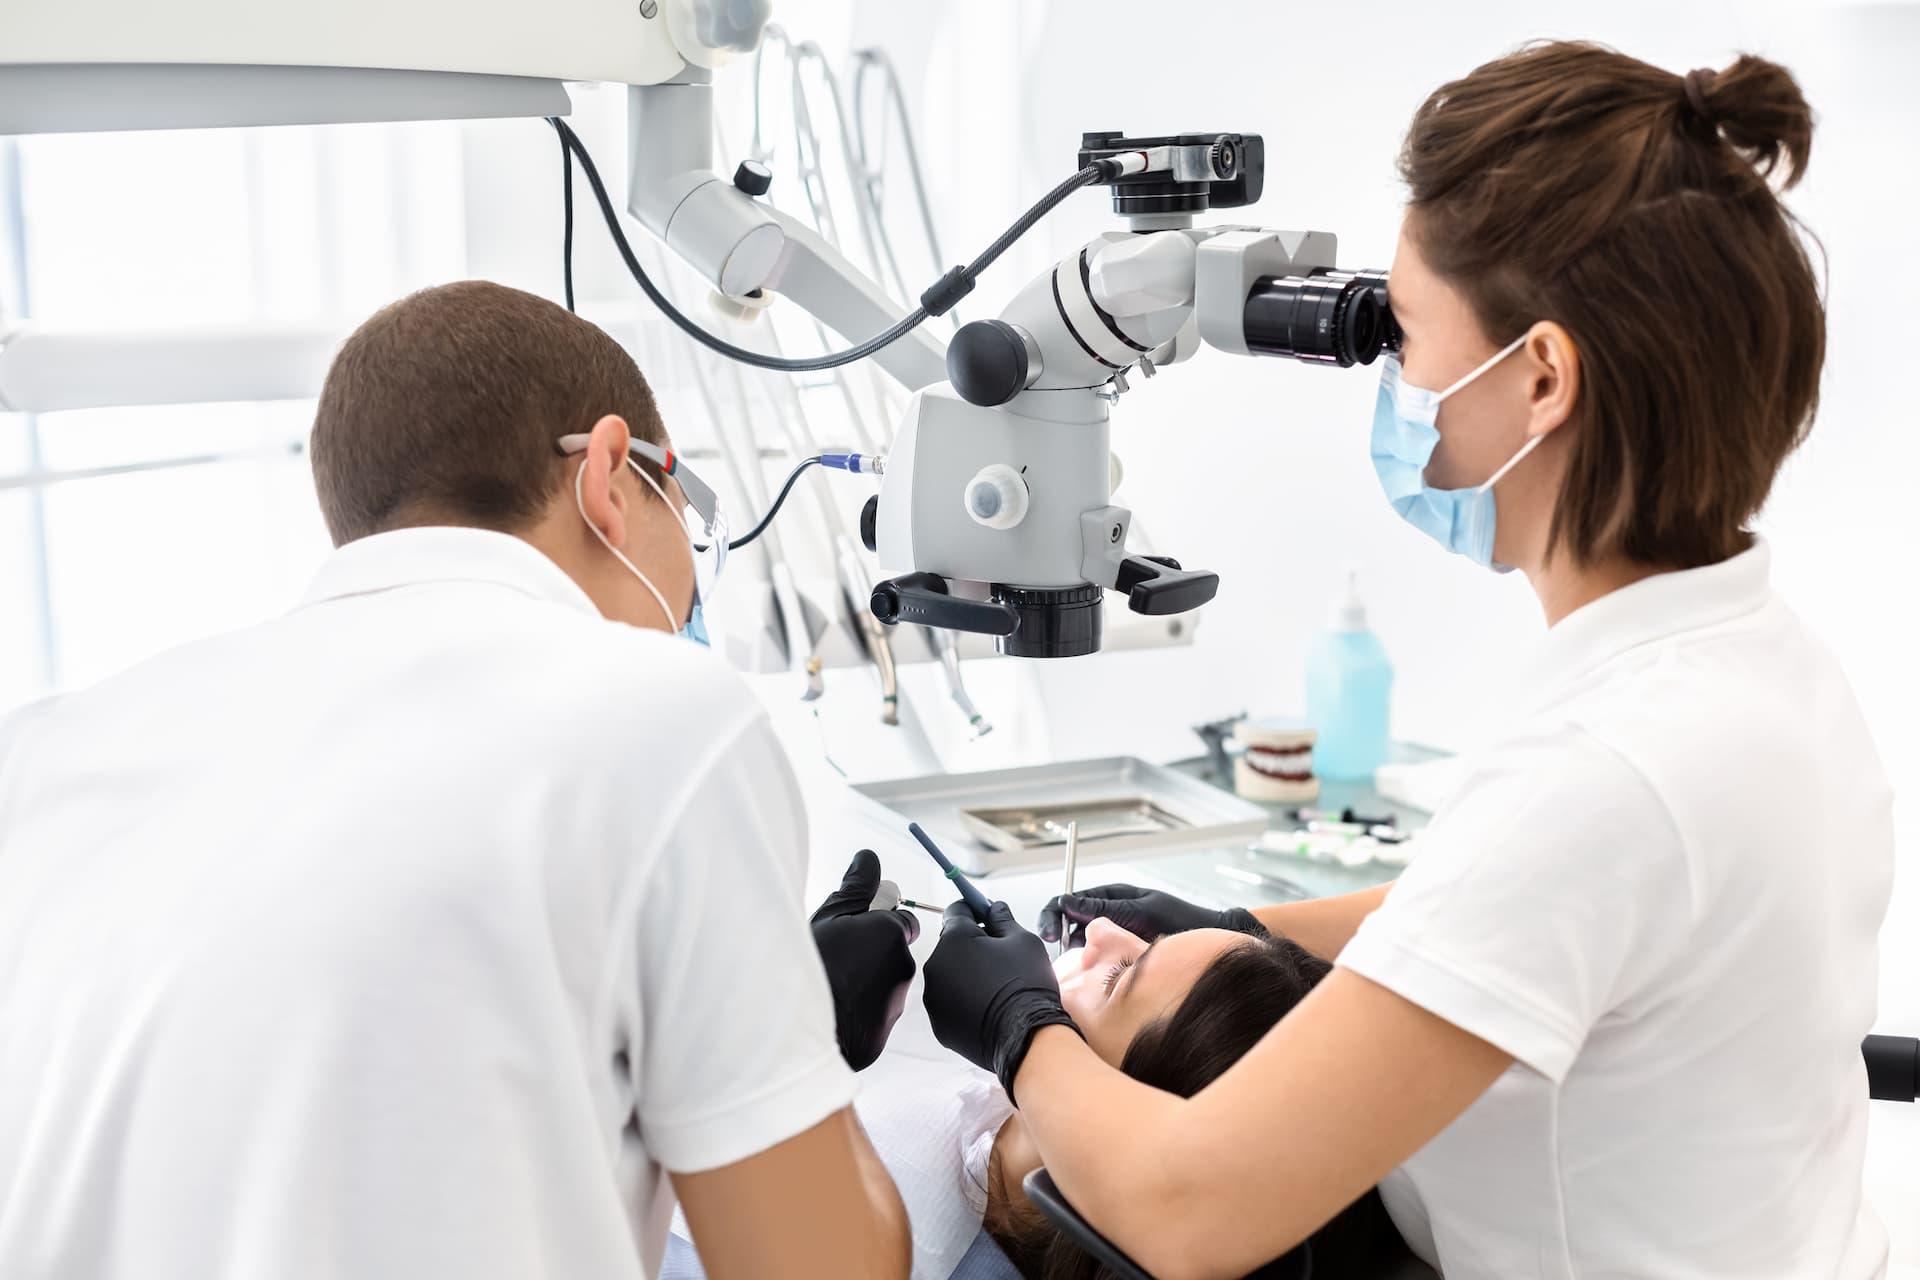 https://osemdental.com/wp-content/uploads/2021/01/Korenovo-lechenie-pod-mikroskop-two-dentists-making-treatment-in-modern-dental-cli-J29396U.jpg